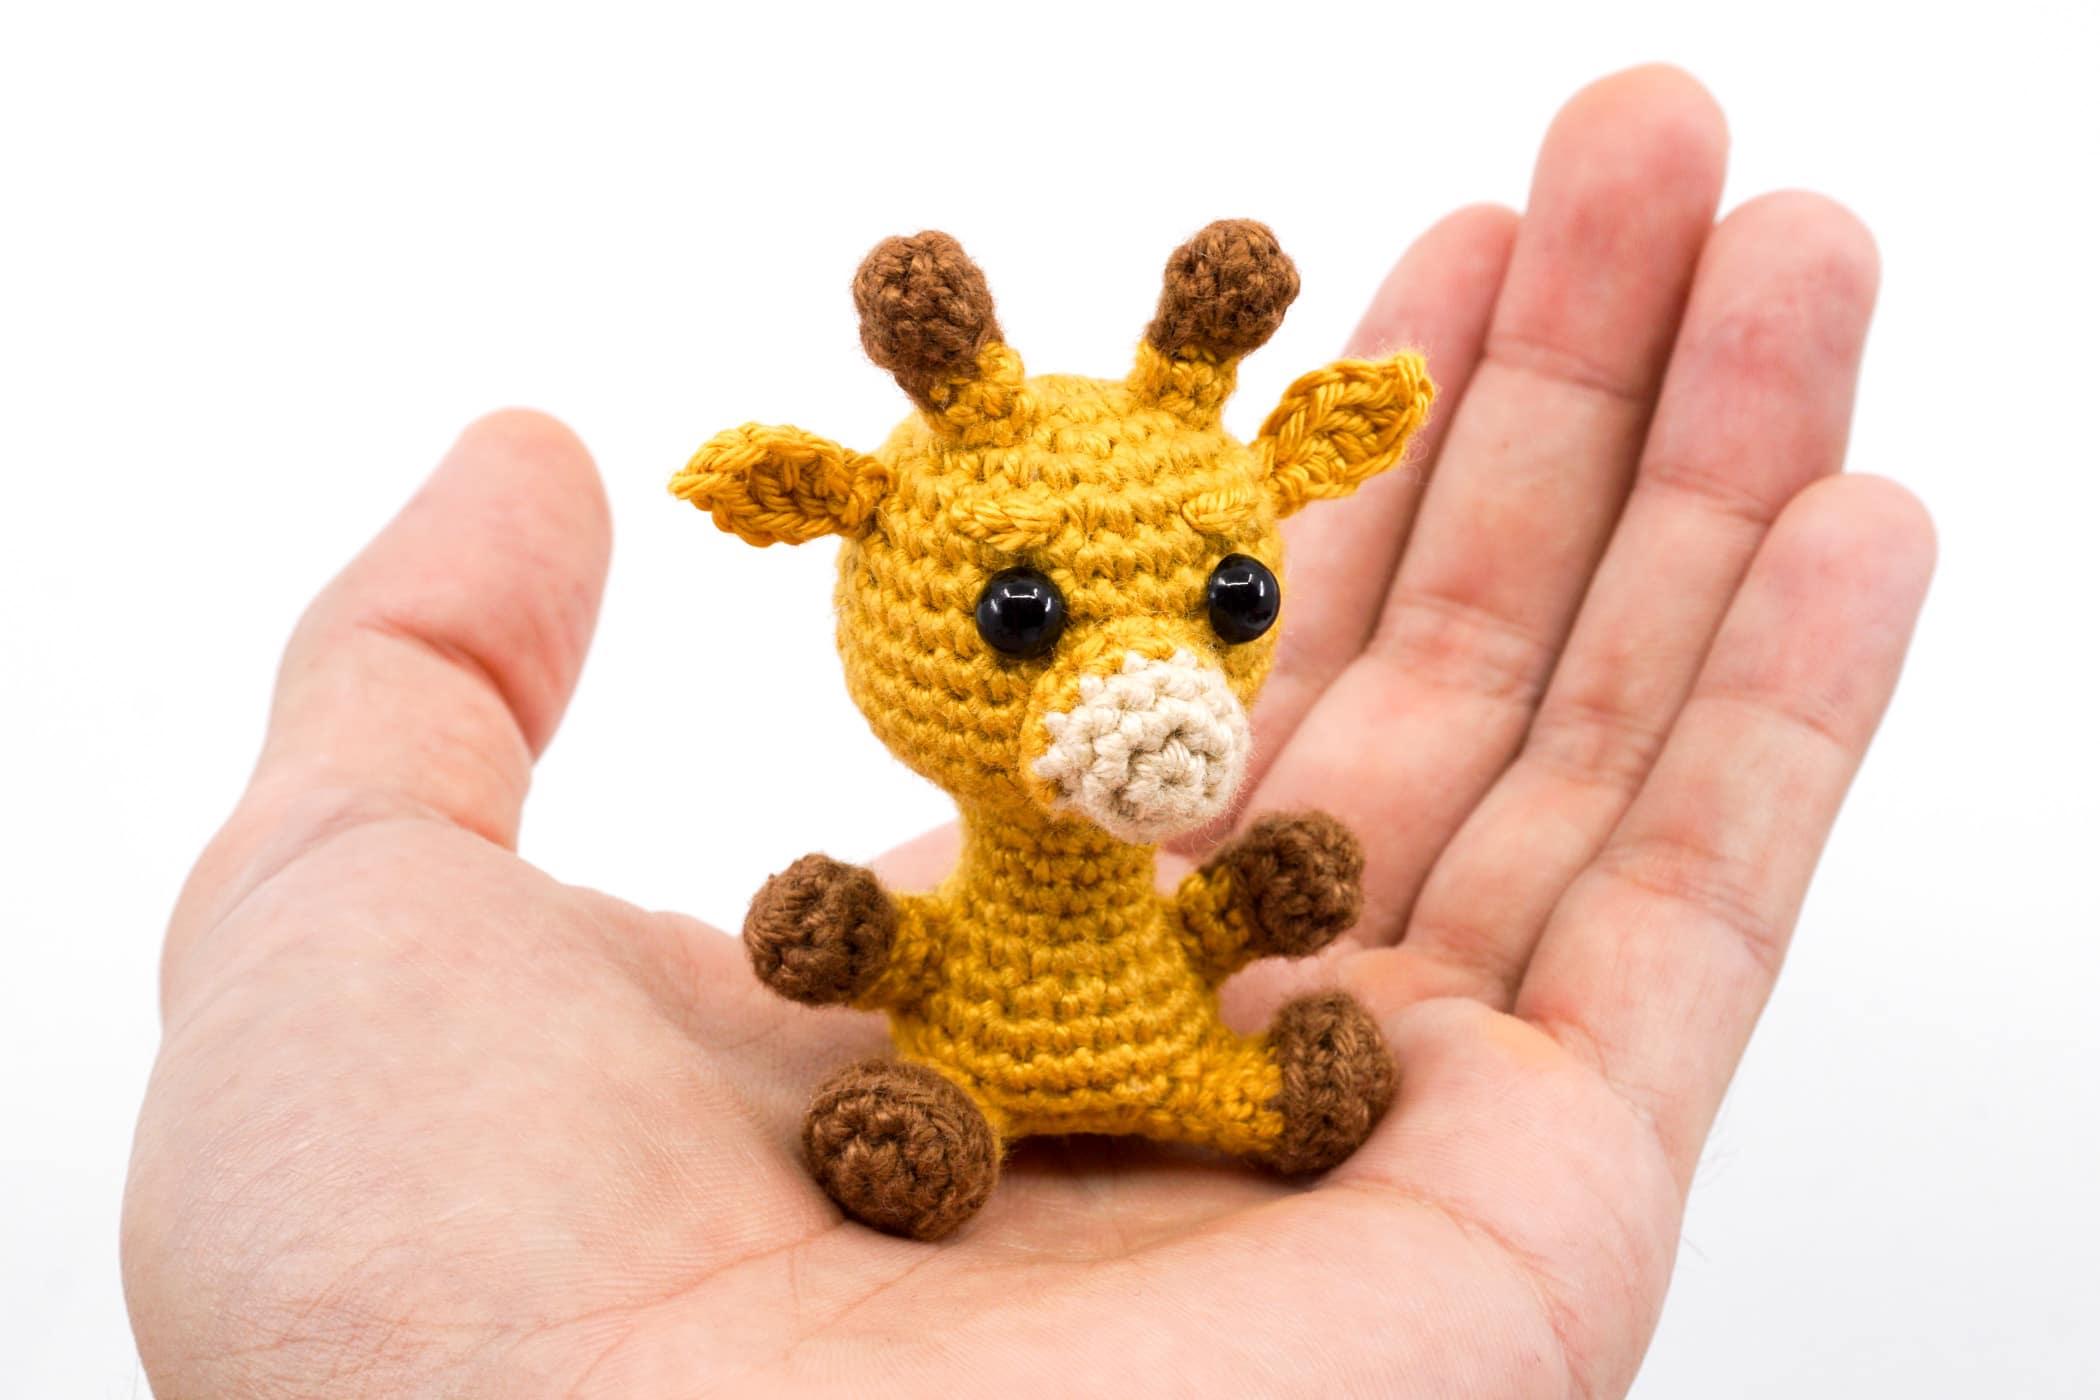 Crochet plush toy giraffe amigurumi   Amiguroom Toys   1400x2100